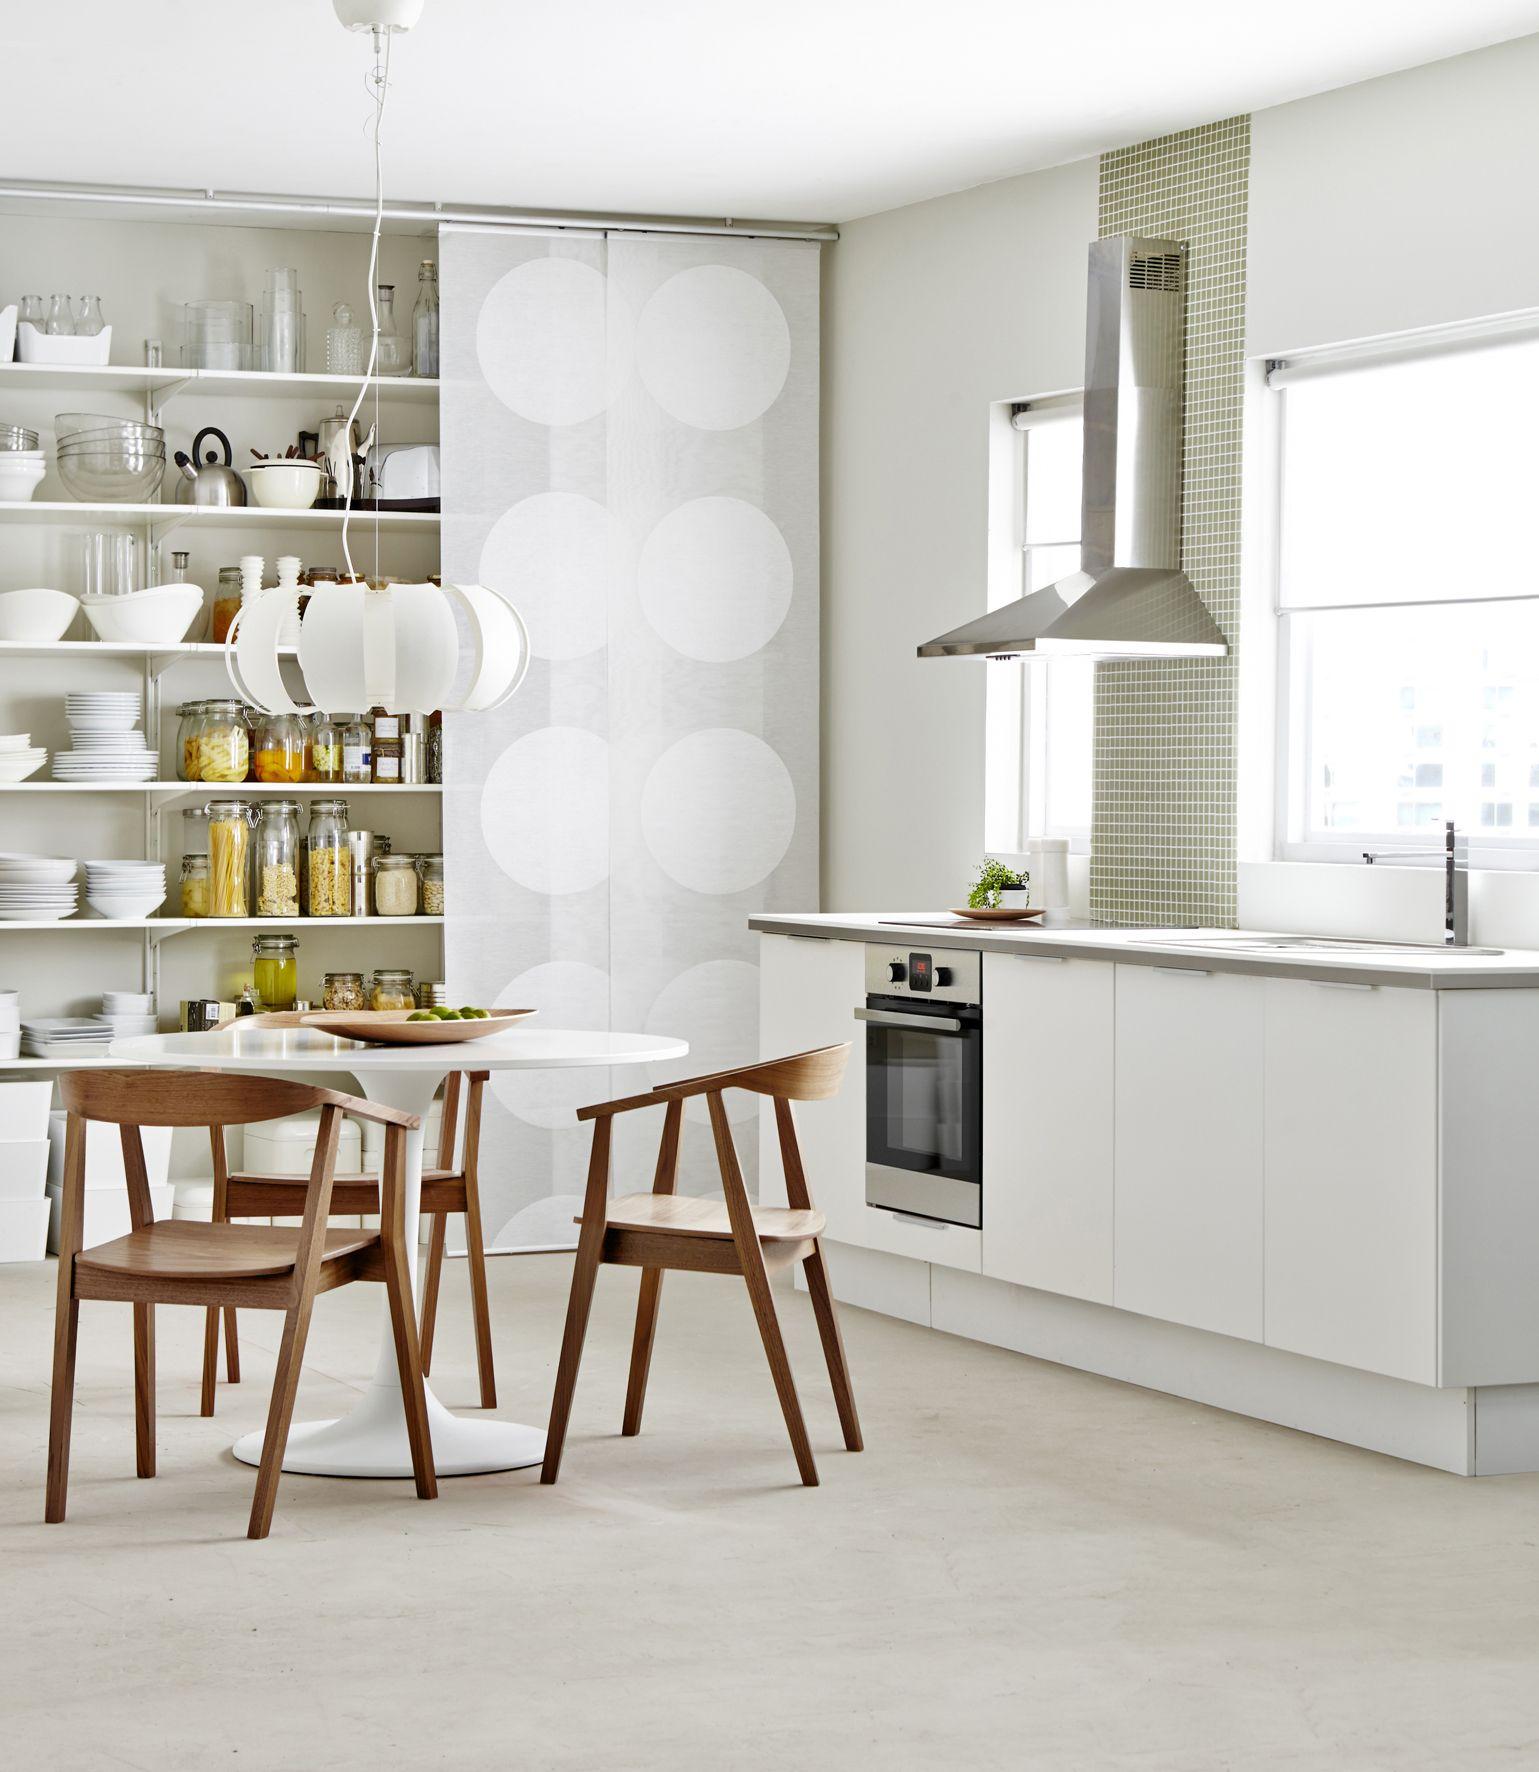 Ikea keuken wit. scandinavisch interieur. faktum keukensystemen ...